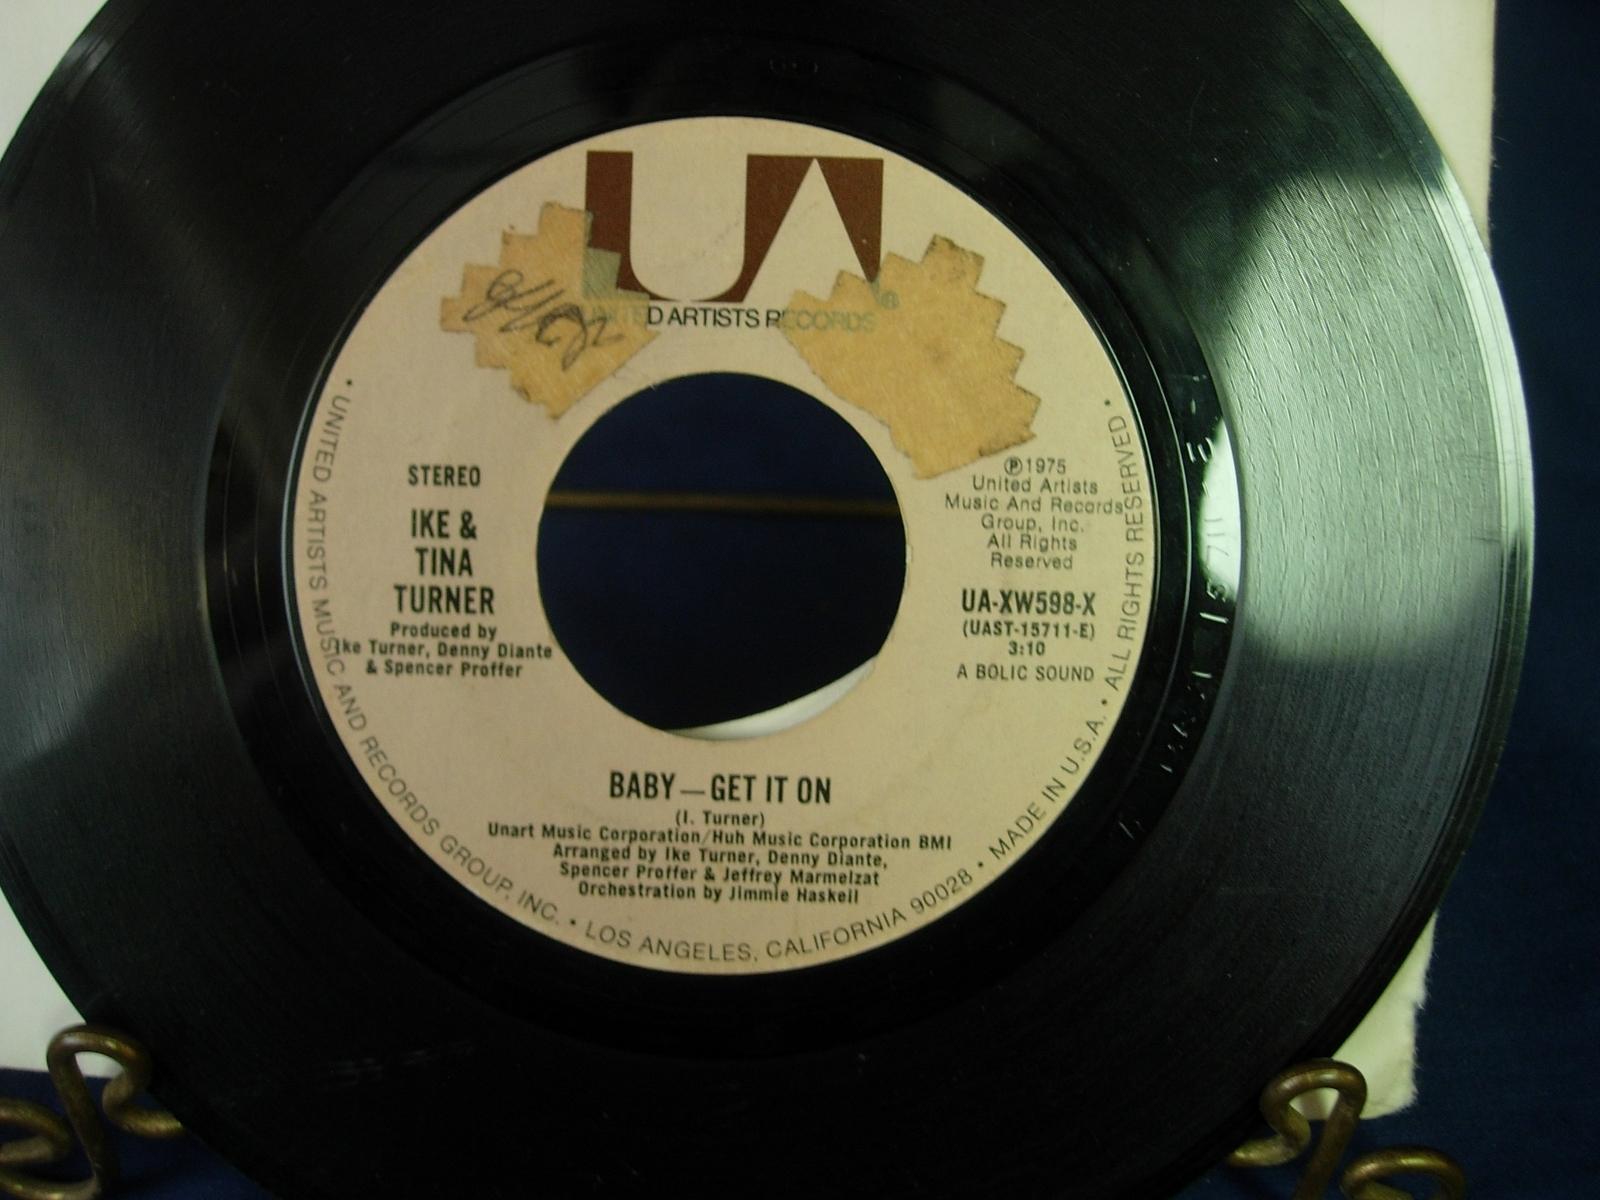 Ike & Tina Turner - Baby Get It On - United Artists UA-XW598-X